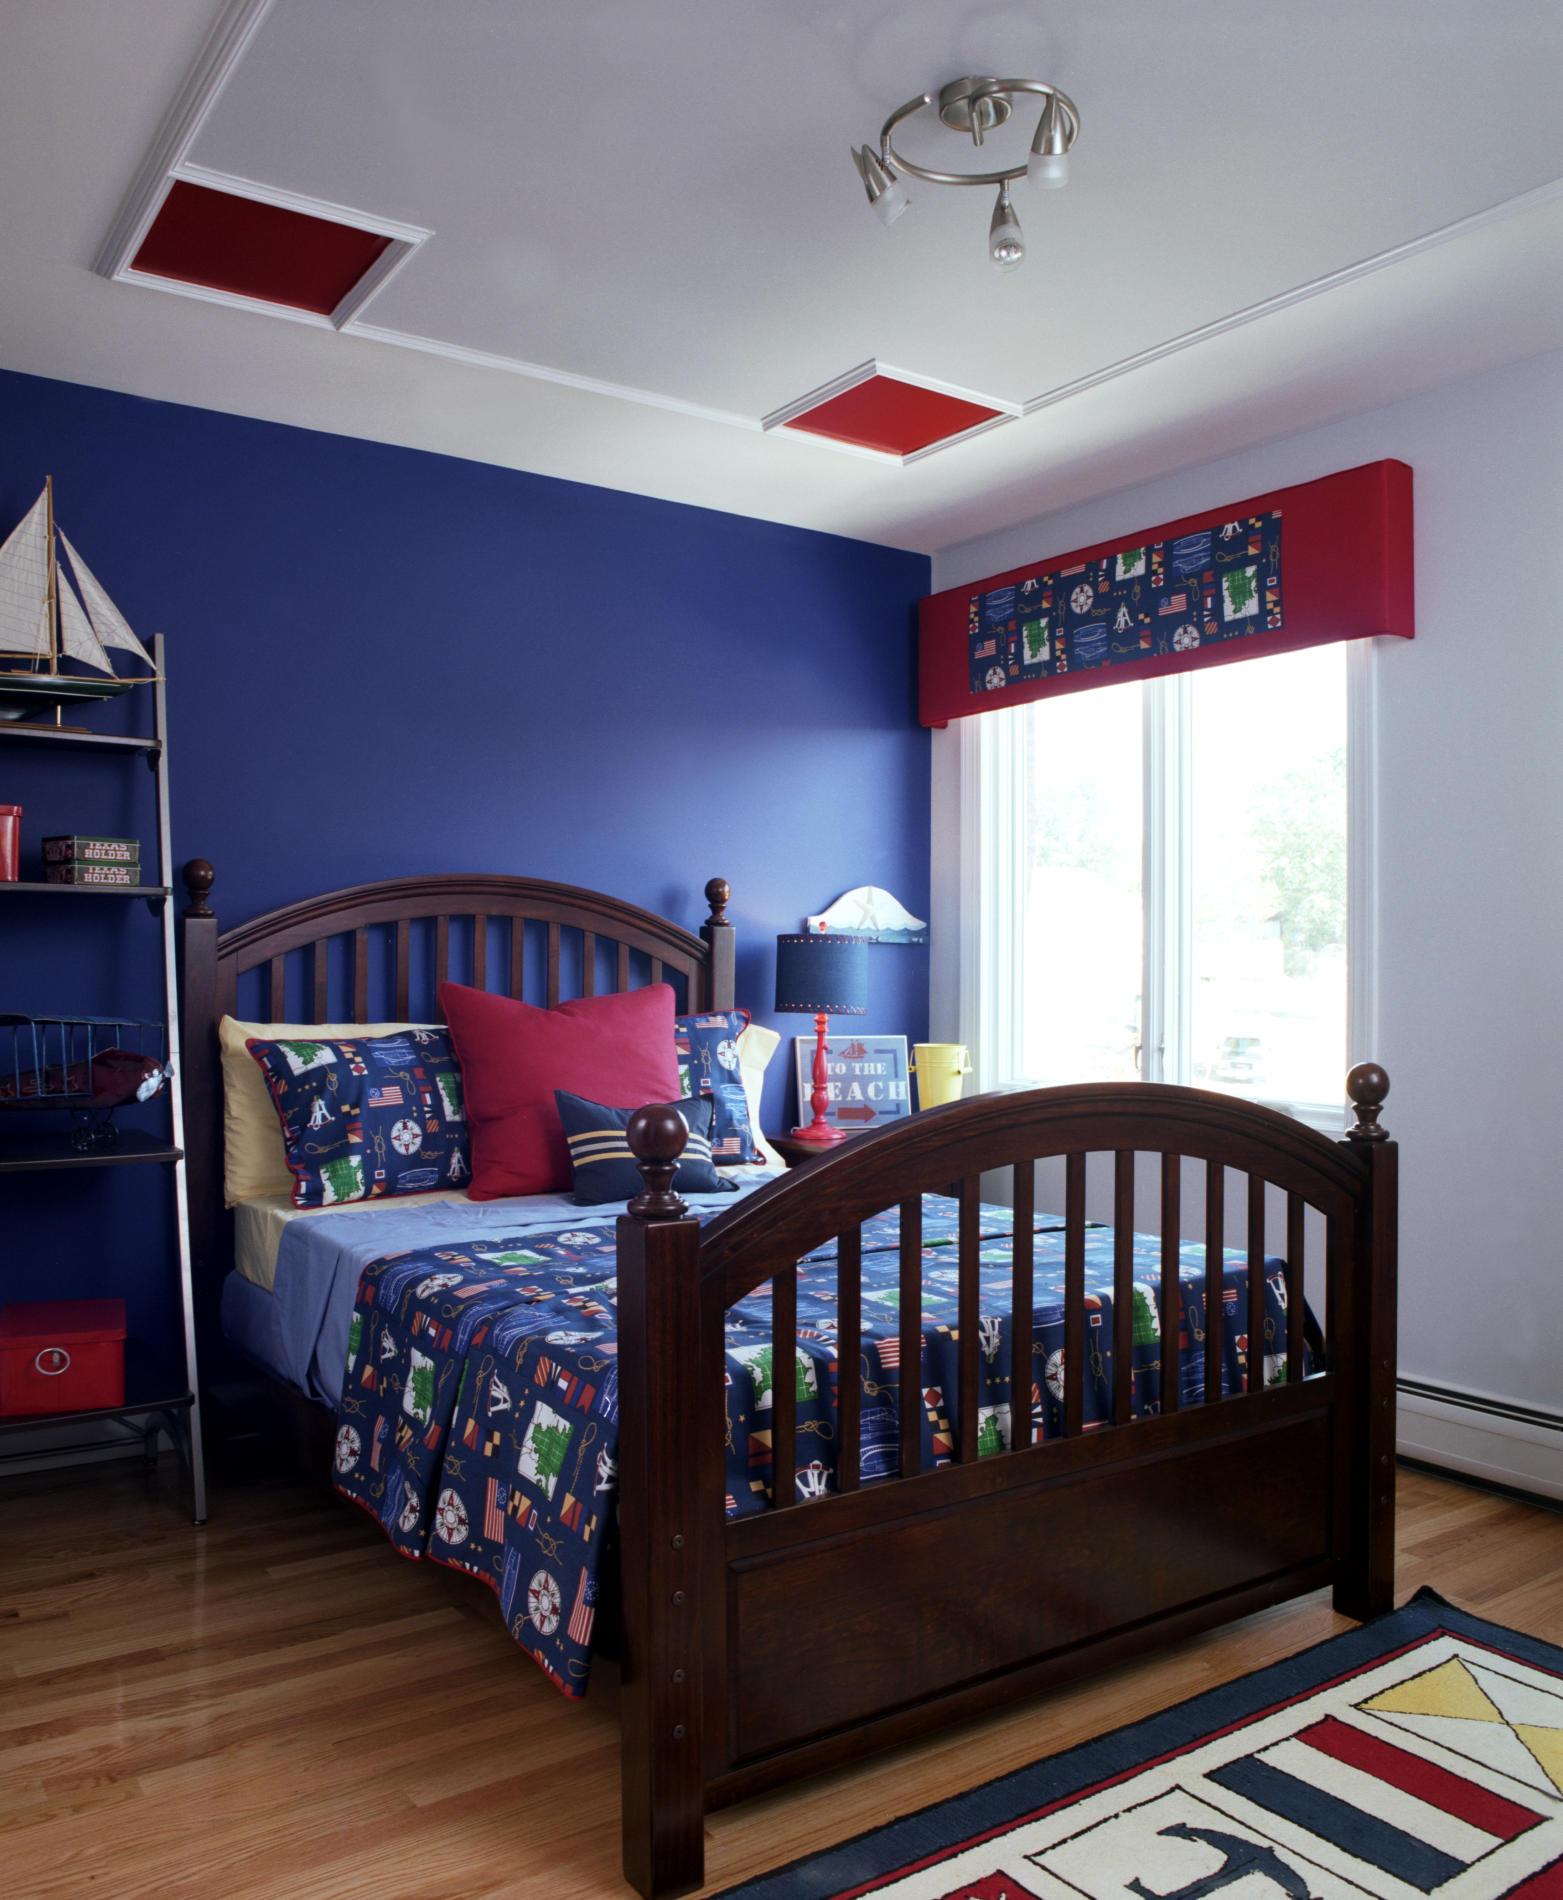 7 Year Old Boys Bedroom Ideas: غرف نوم اولاد وشباب مودرن بالوان جديدة 2017